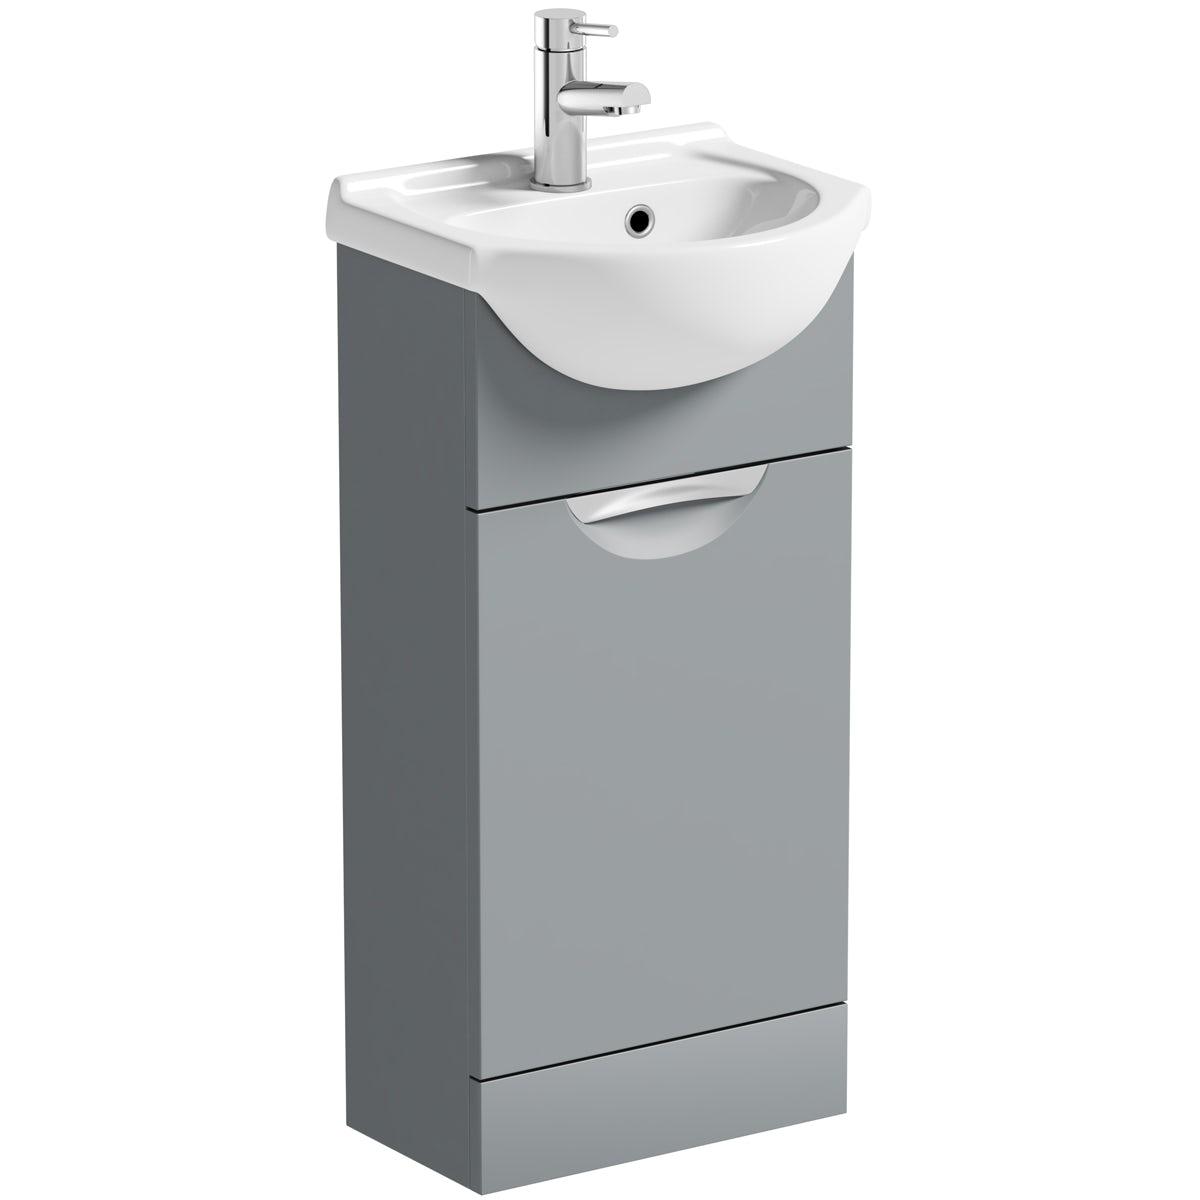 Orchard Elsdon stone grey vanity unit and basin 410mm